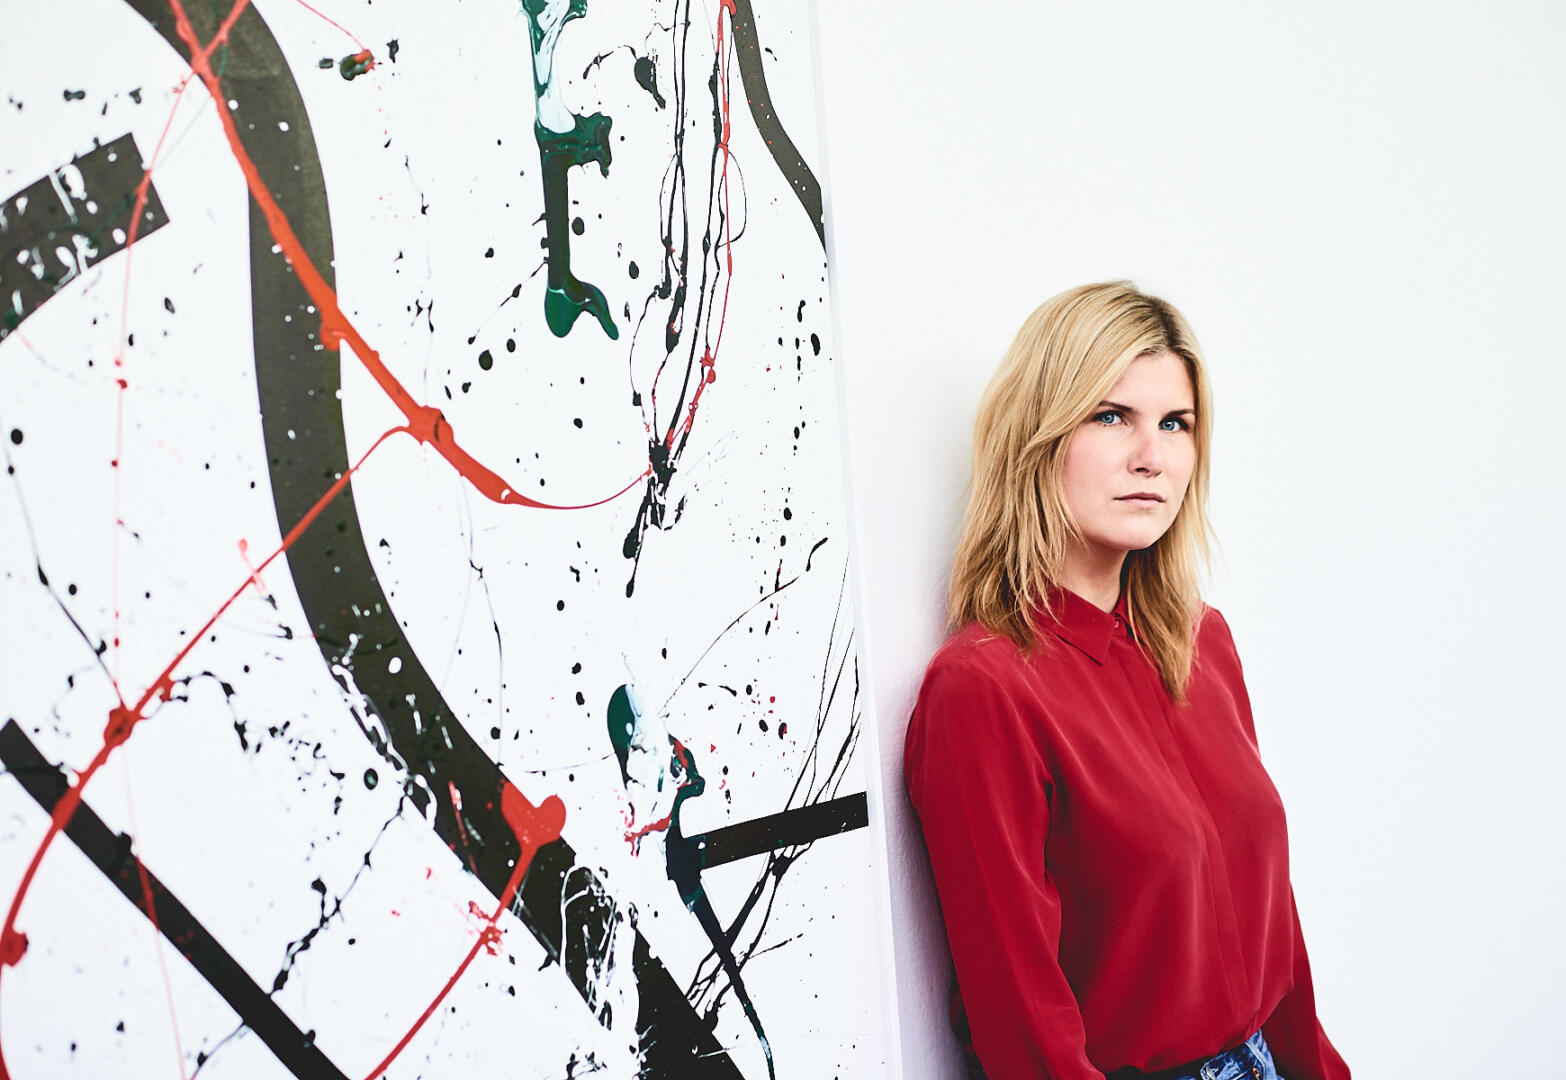 Künstlerportraits, Danni Pantel | Künstlerportraits, Reportage, Martin Peterdamm Photography